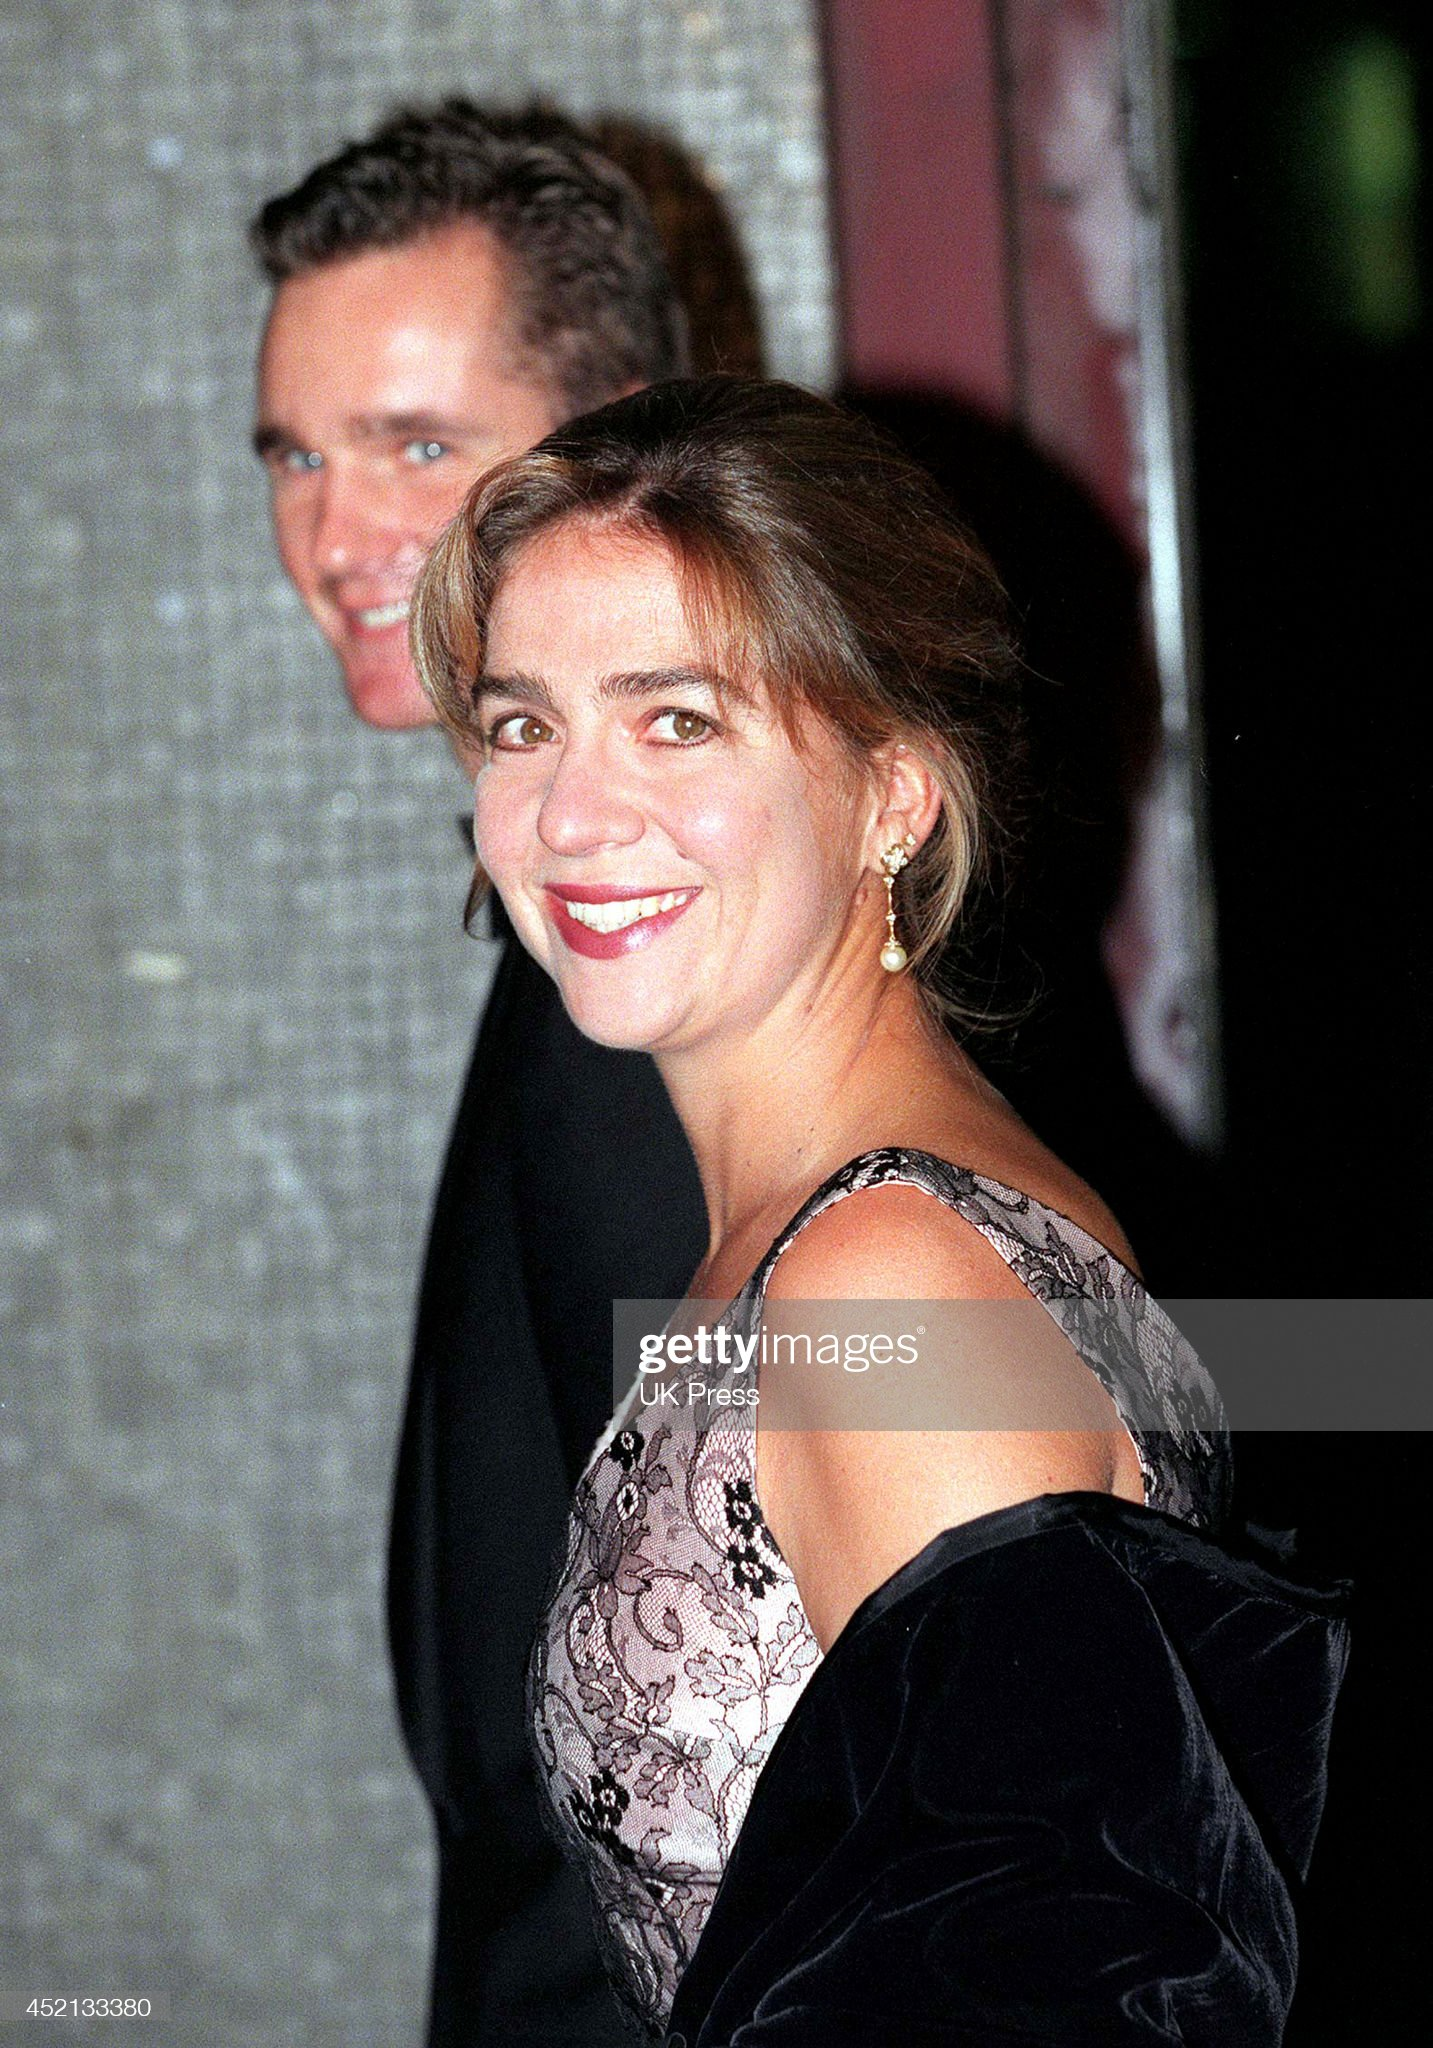 Queen Elizabeth II, and Prince Philip, Duke of Edinburgh, Golden Wedding Anniversary : News Photo